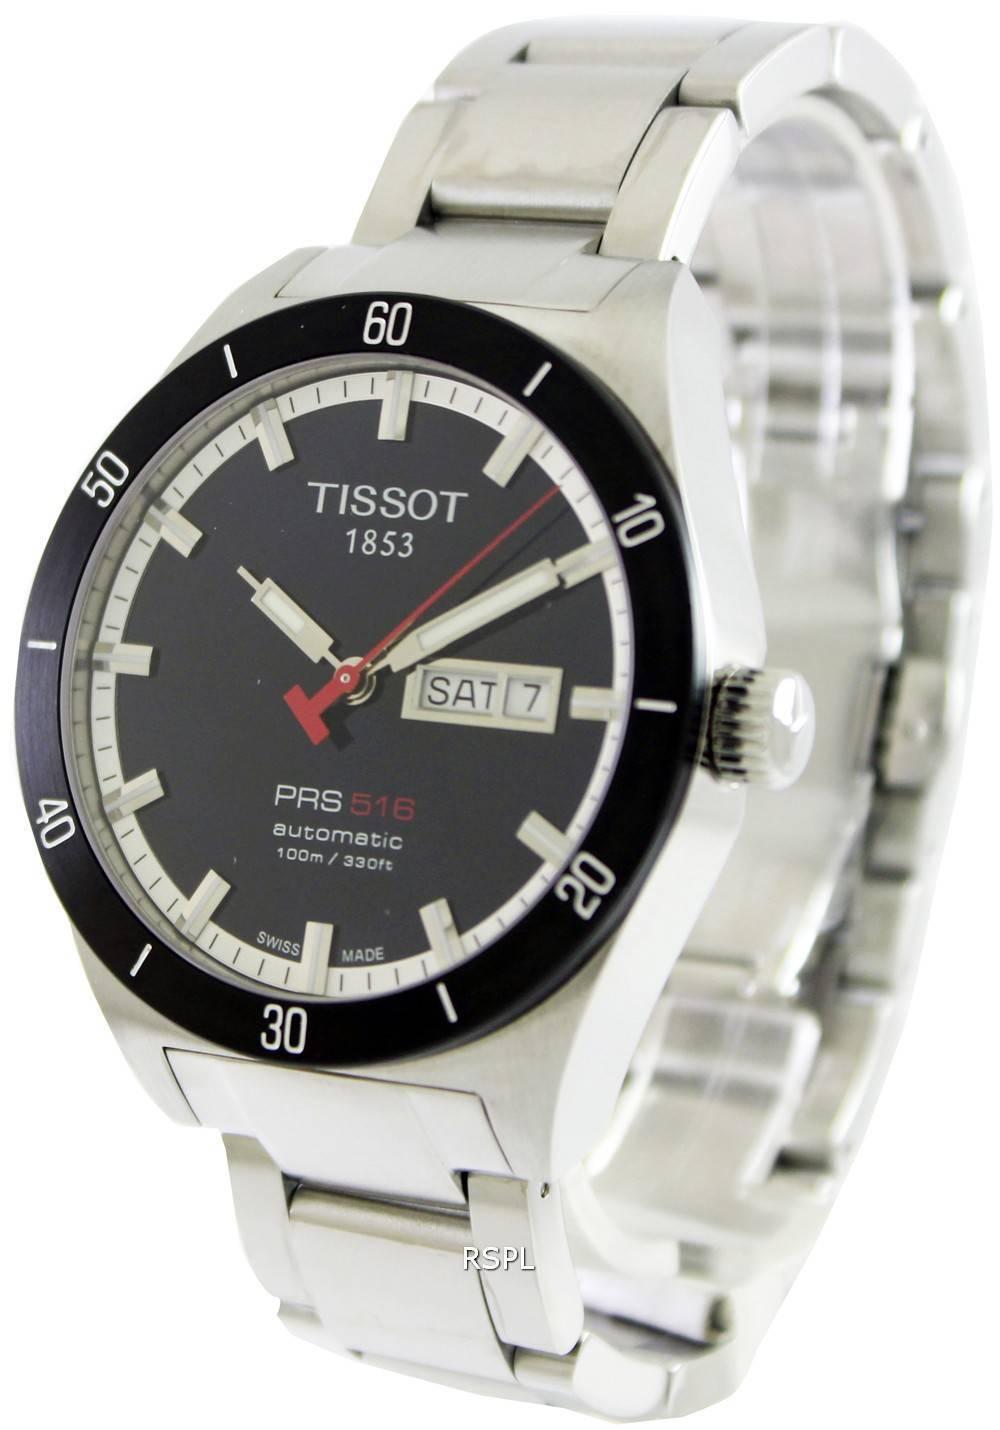 88ee91d6898 Tissot T-Sport PRS 516 Automatic T044.430.21.041.00 Watch ...